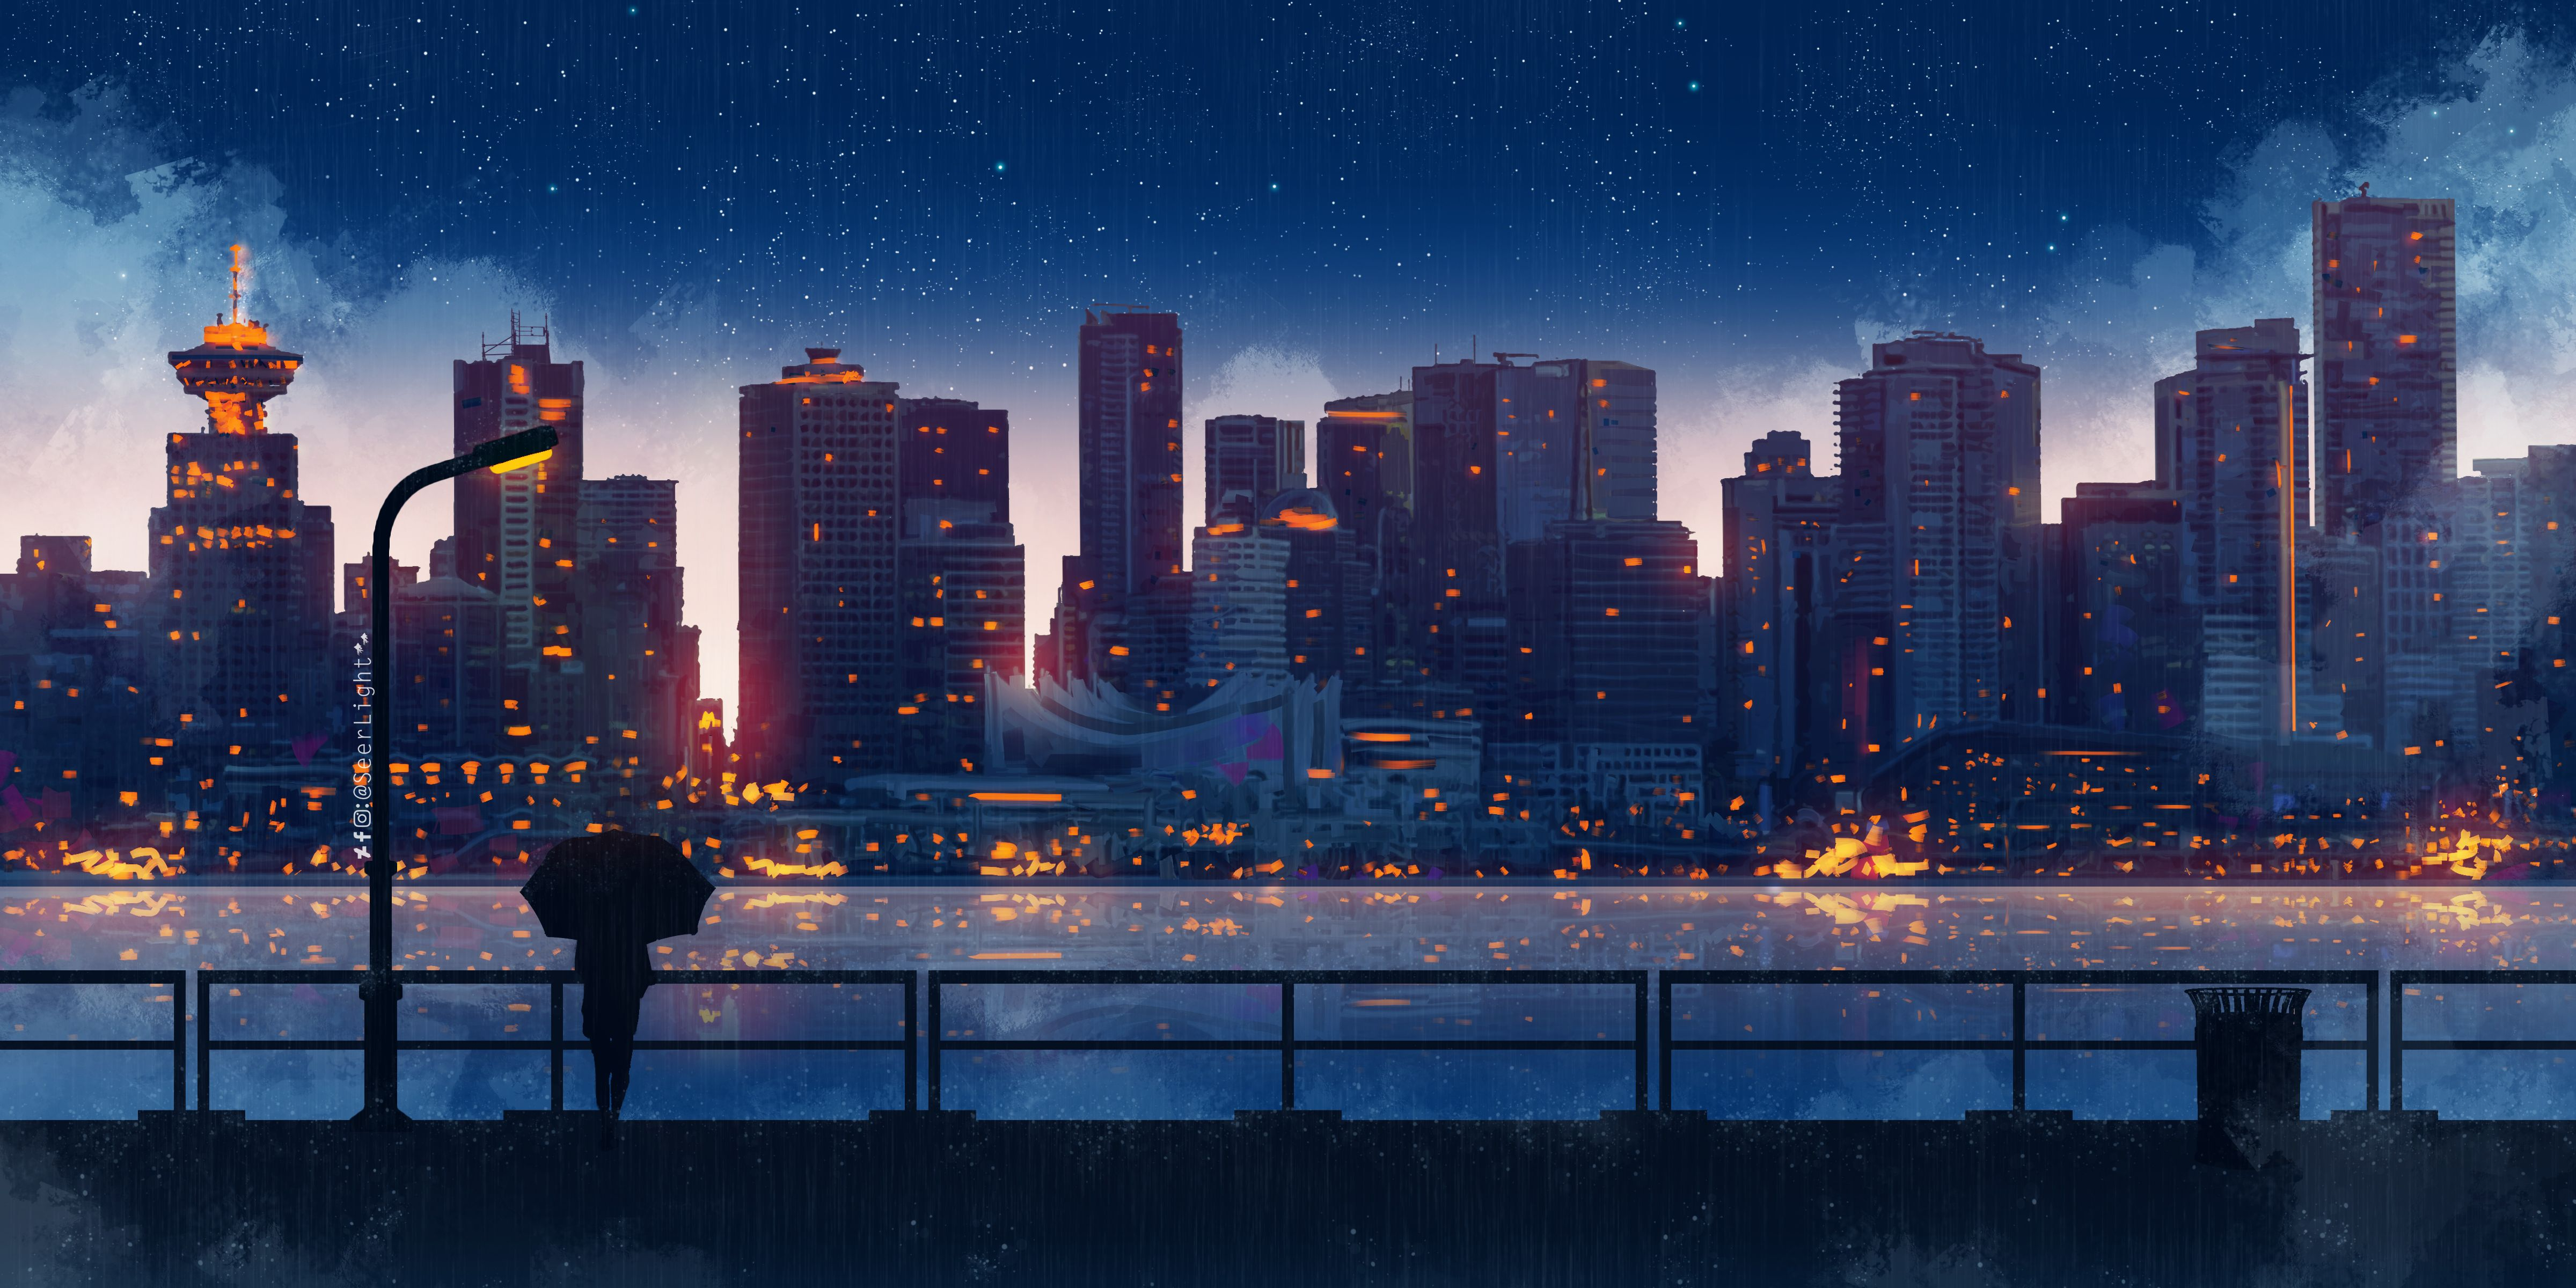 Anime 4800x2400 Anime City Building Women Umbrella Night Painting Digital Art Seerlight In 2020 Night Scenery Cityscape Wallpaper Anime City